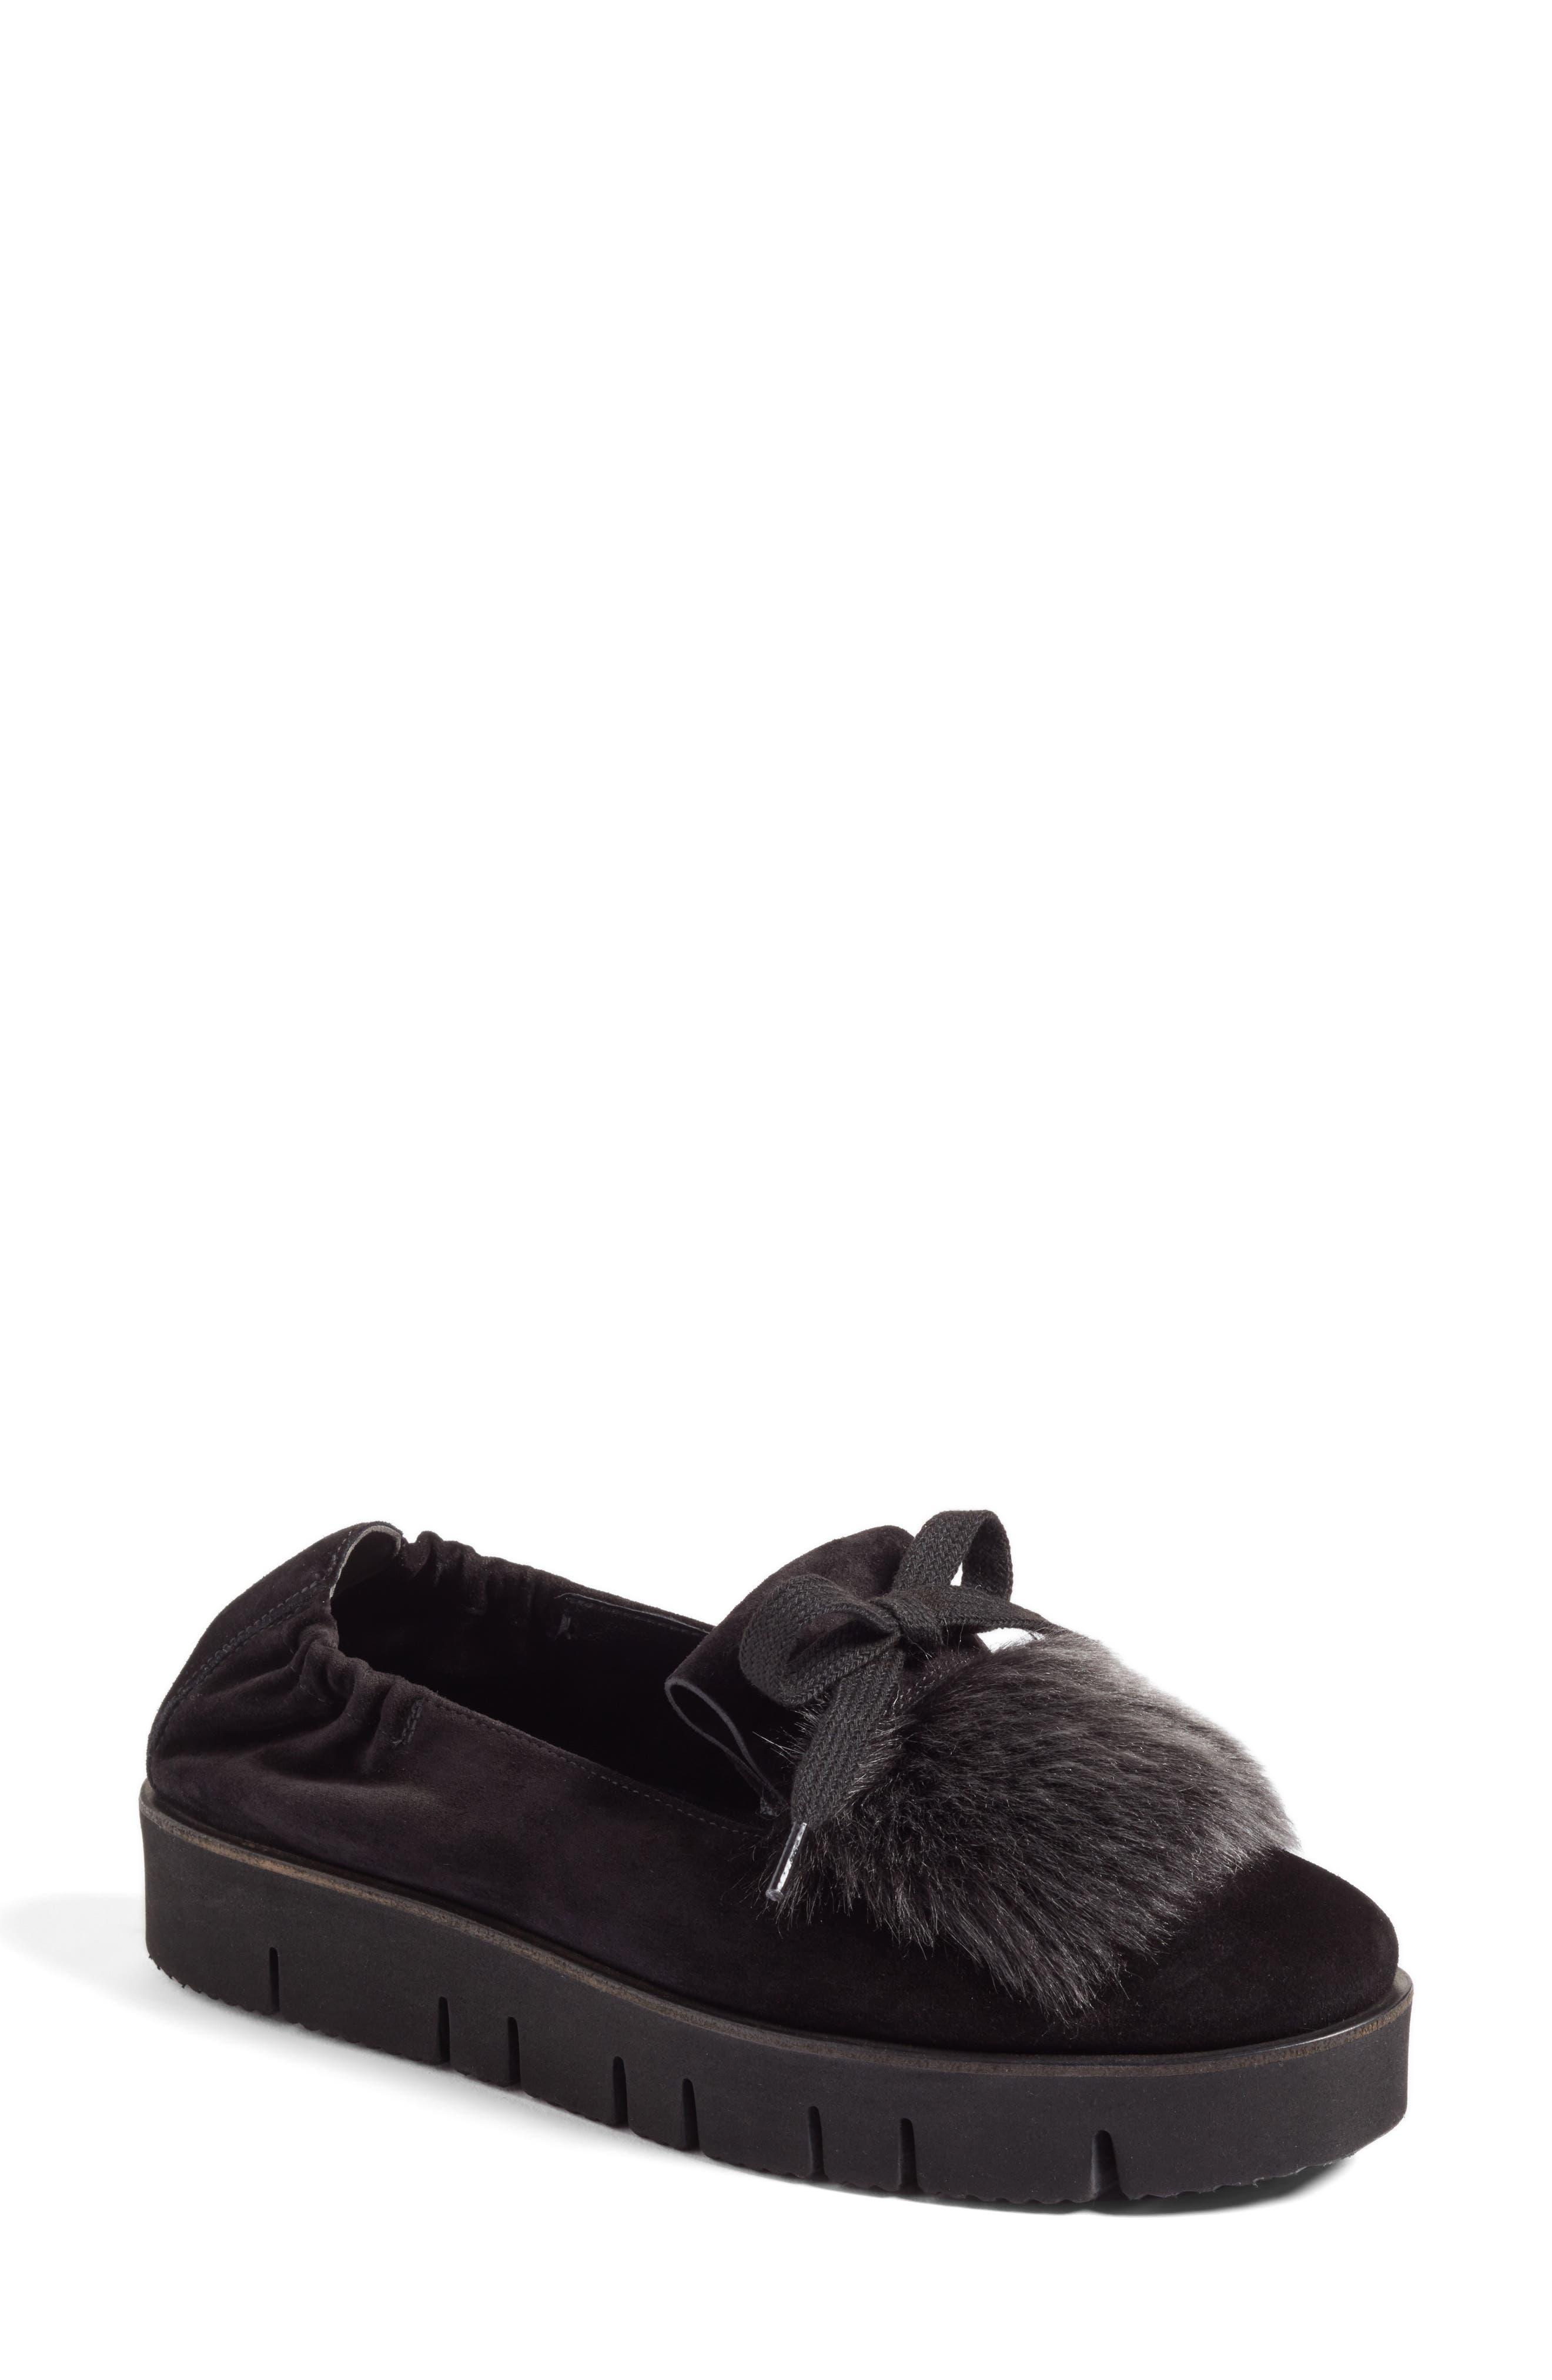 Kennel & Schmenger Malu Suede & Genuine Shearling Slip-On Sneaker,                             Main thumbnail 1, color,                             Black